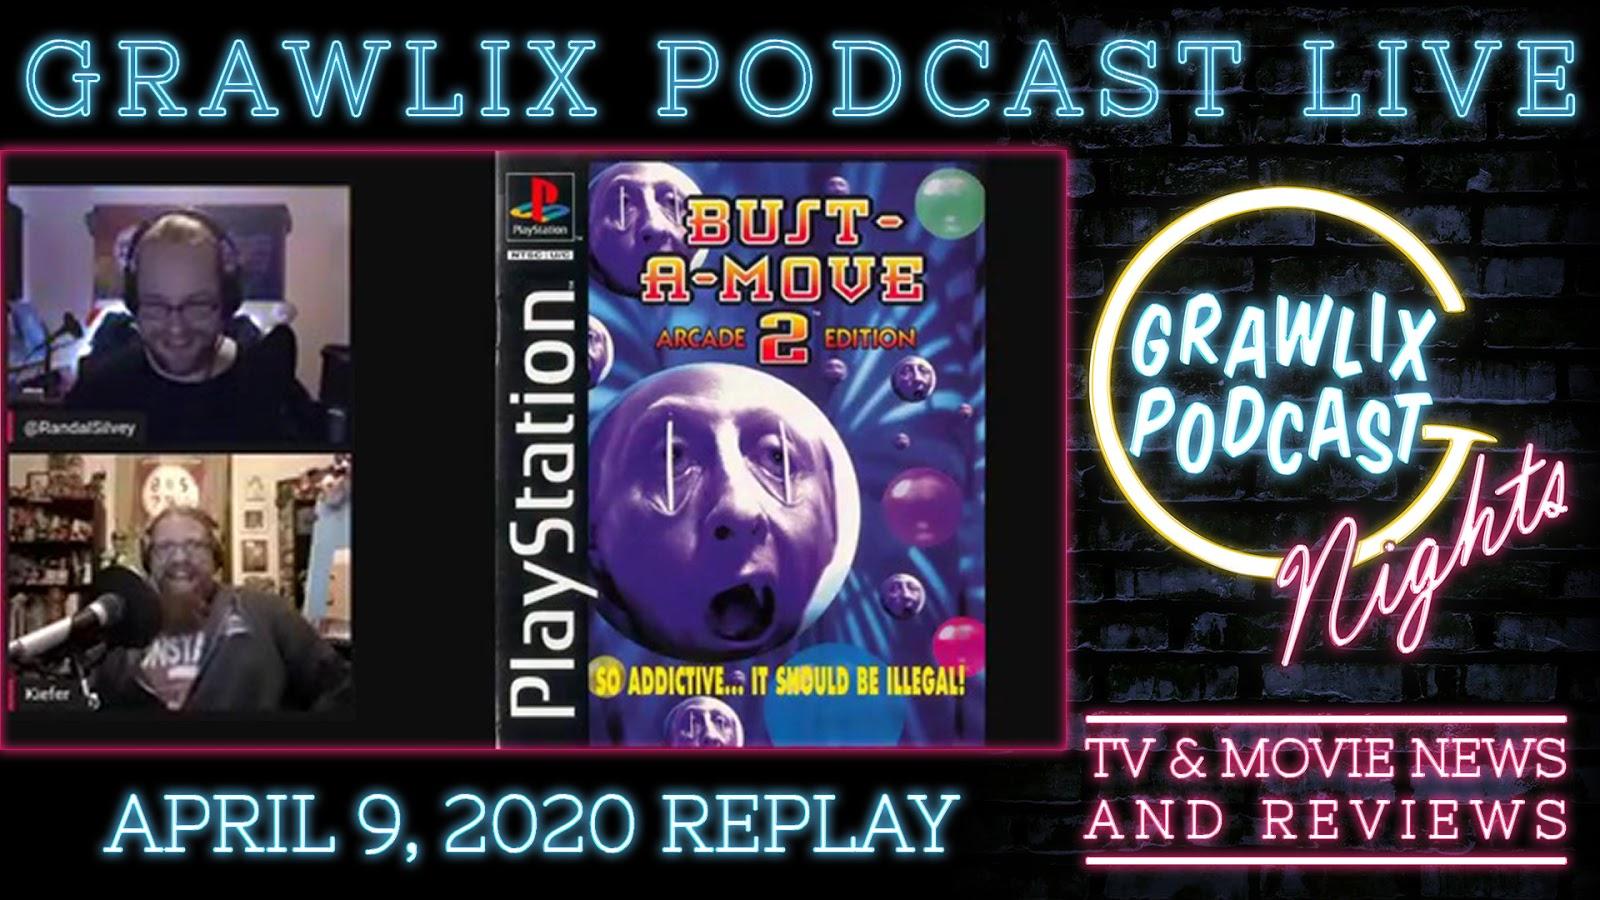 Grawlix Podcast Live